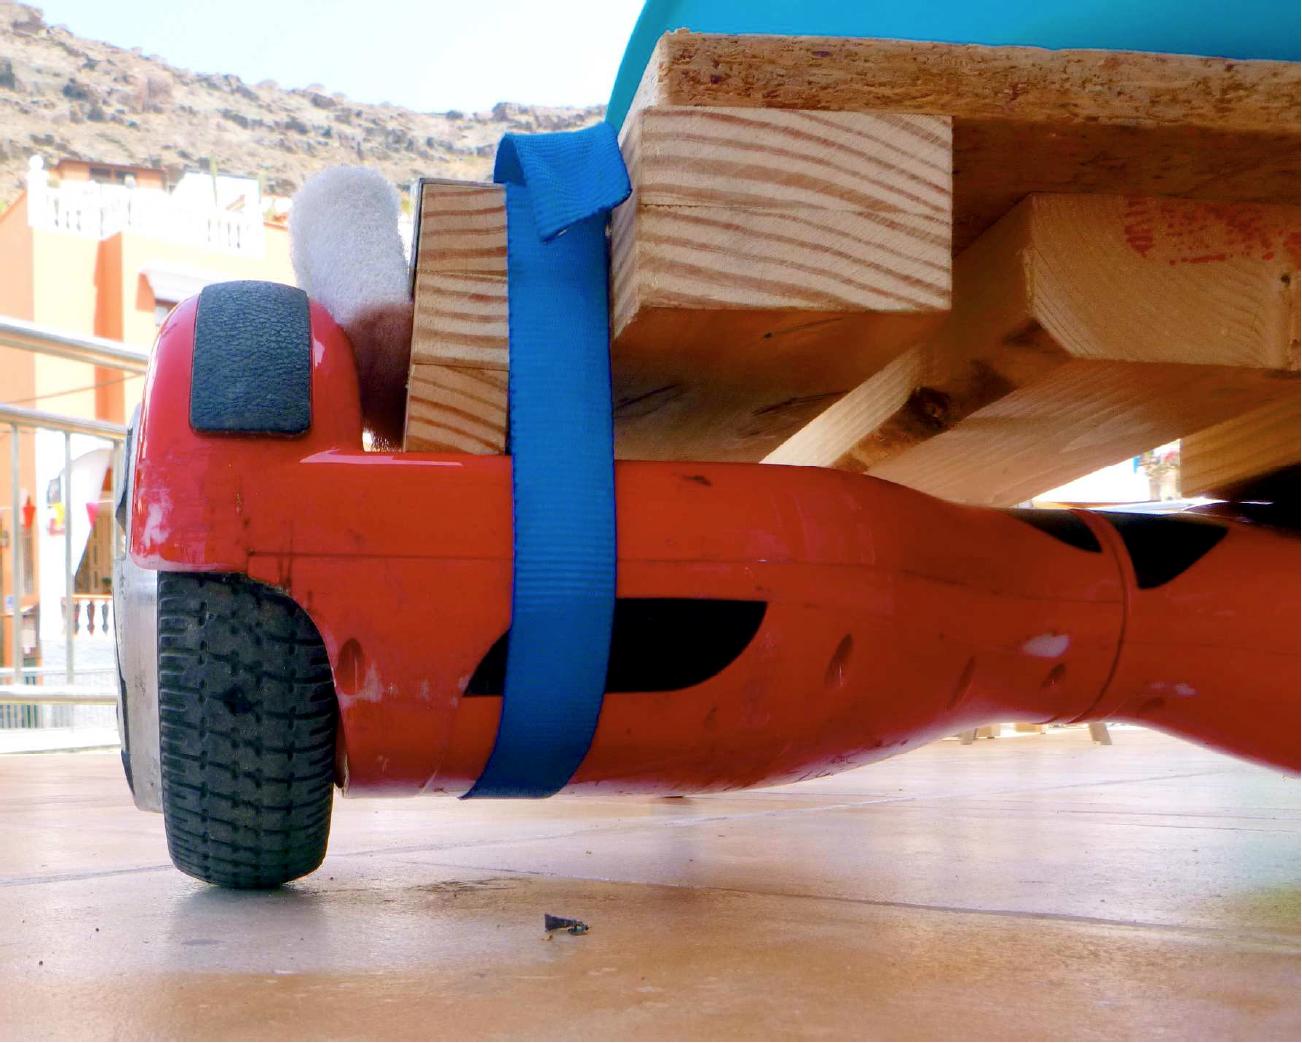 anleitung seifenkiste mit hoverboard antrieb make. Black Bedroom Furniture Sets. Home Design Ideas